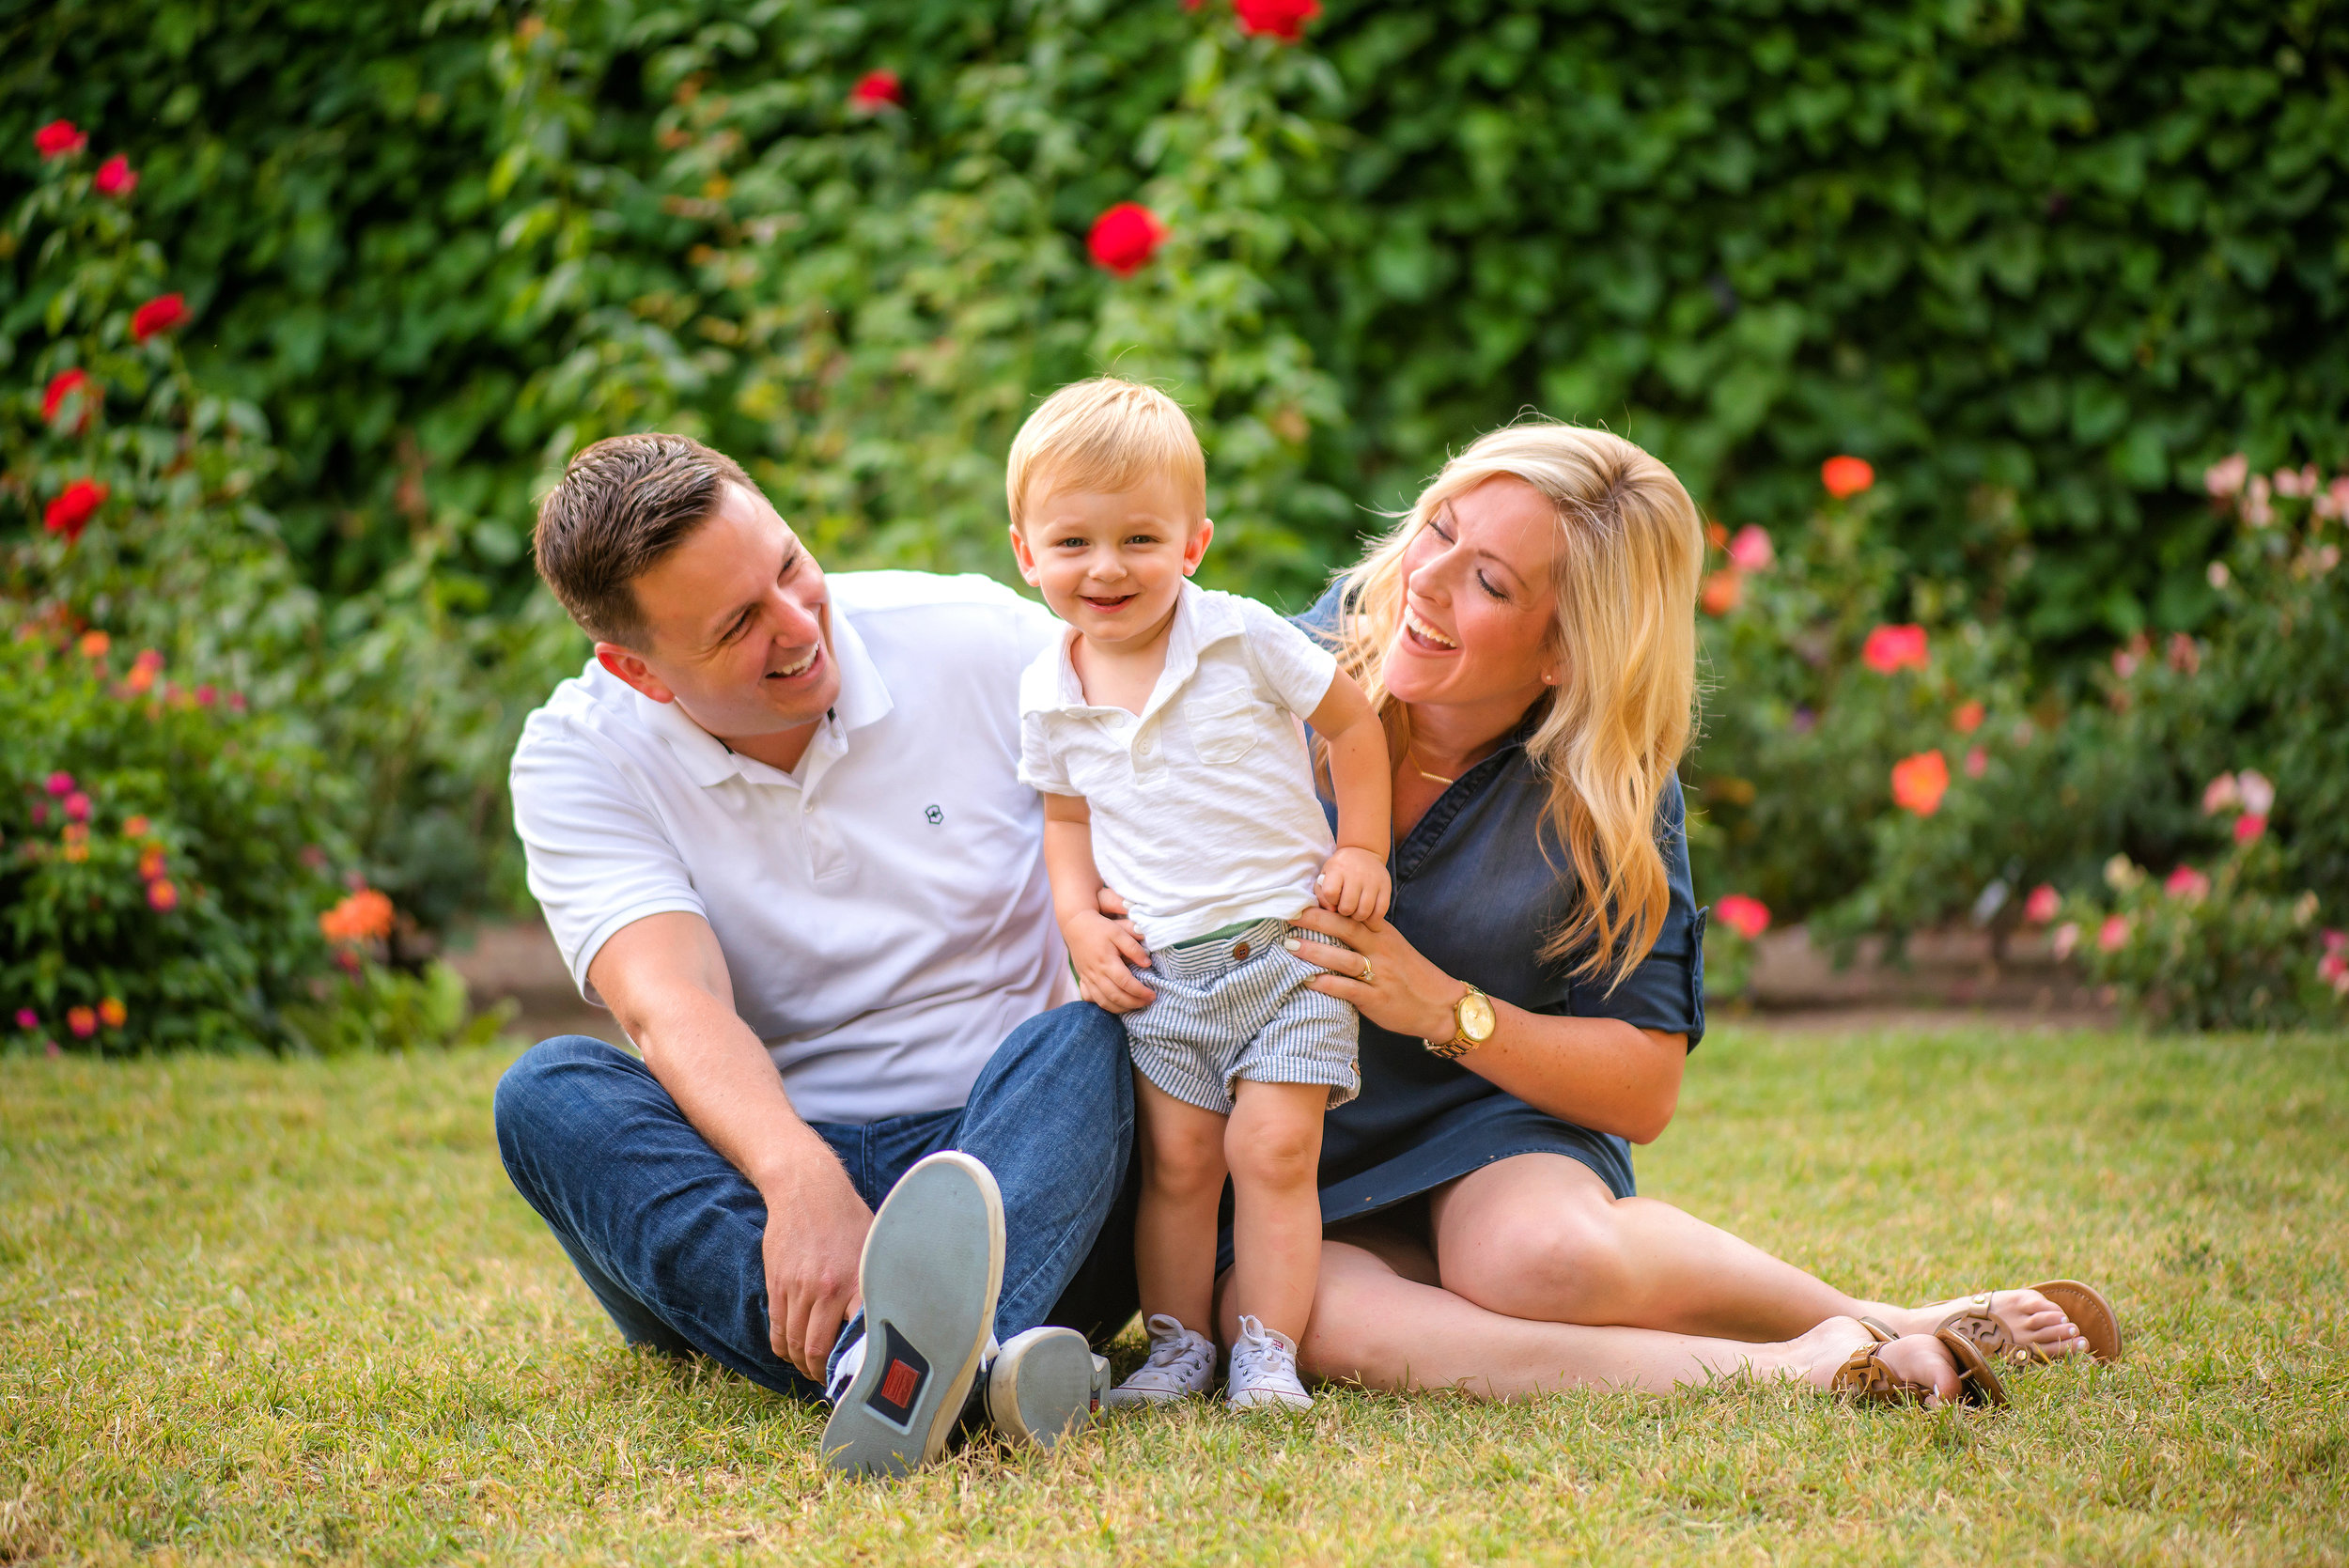 erickson-family-103-sacramento-family-photographer-katherine-nicole-photography.JPG